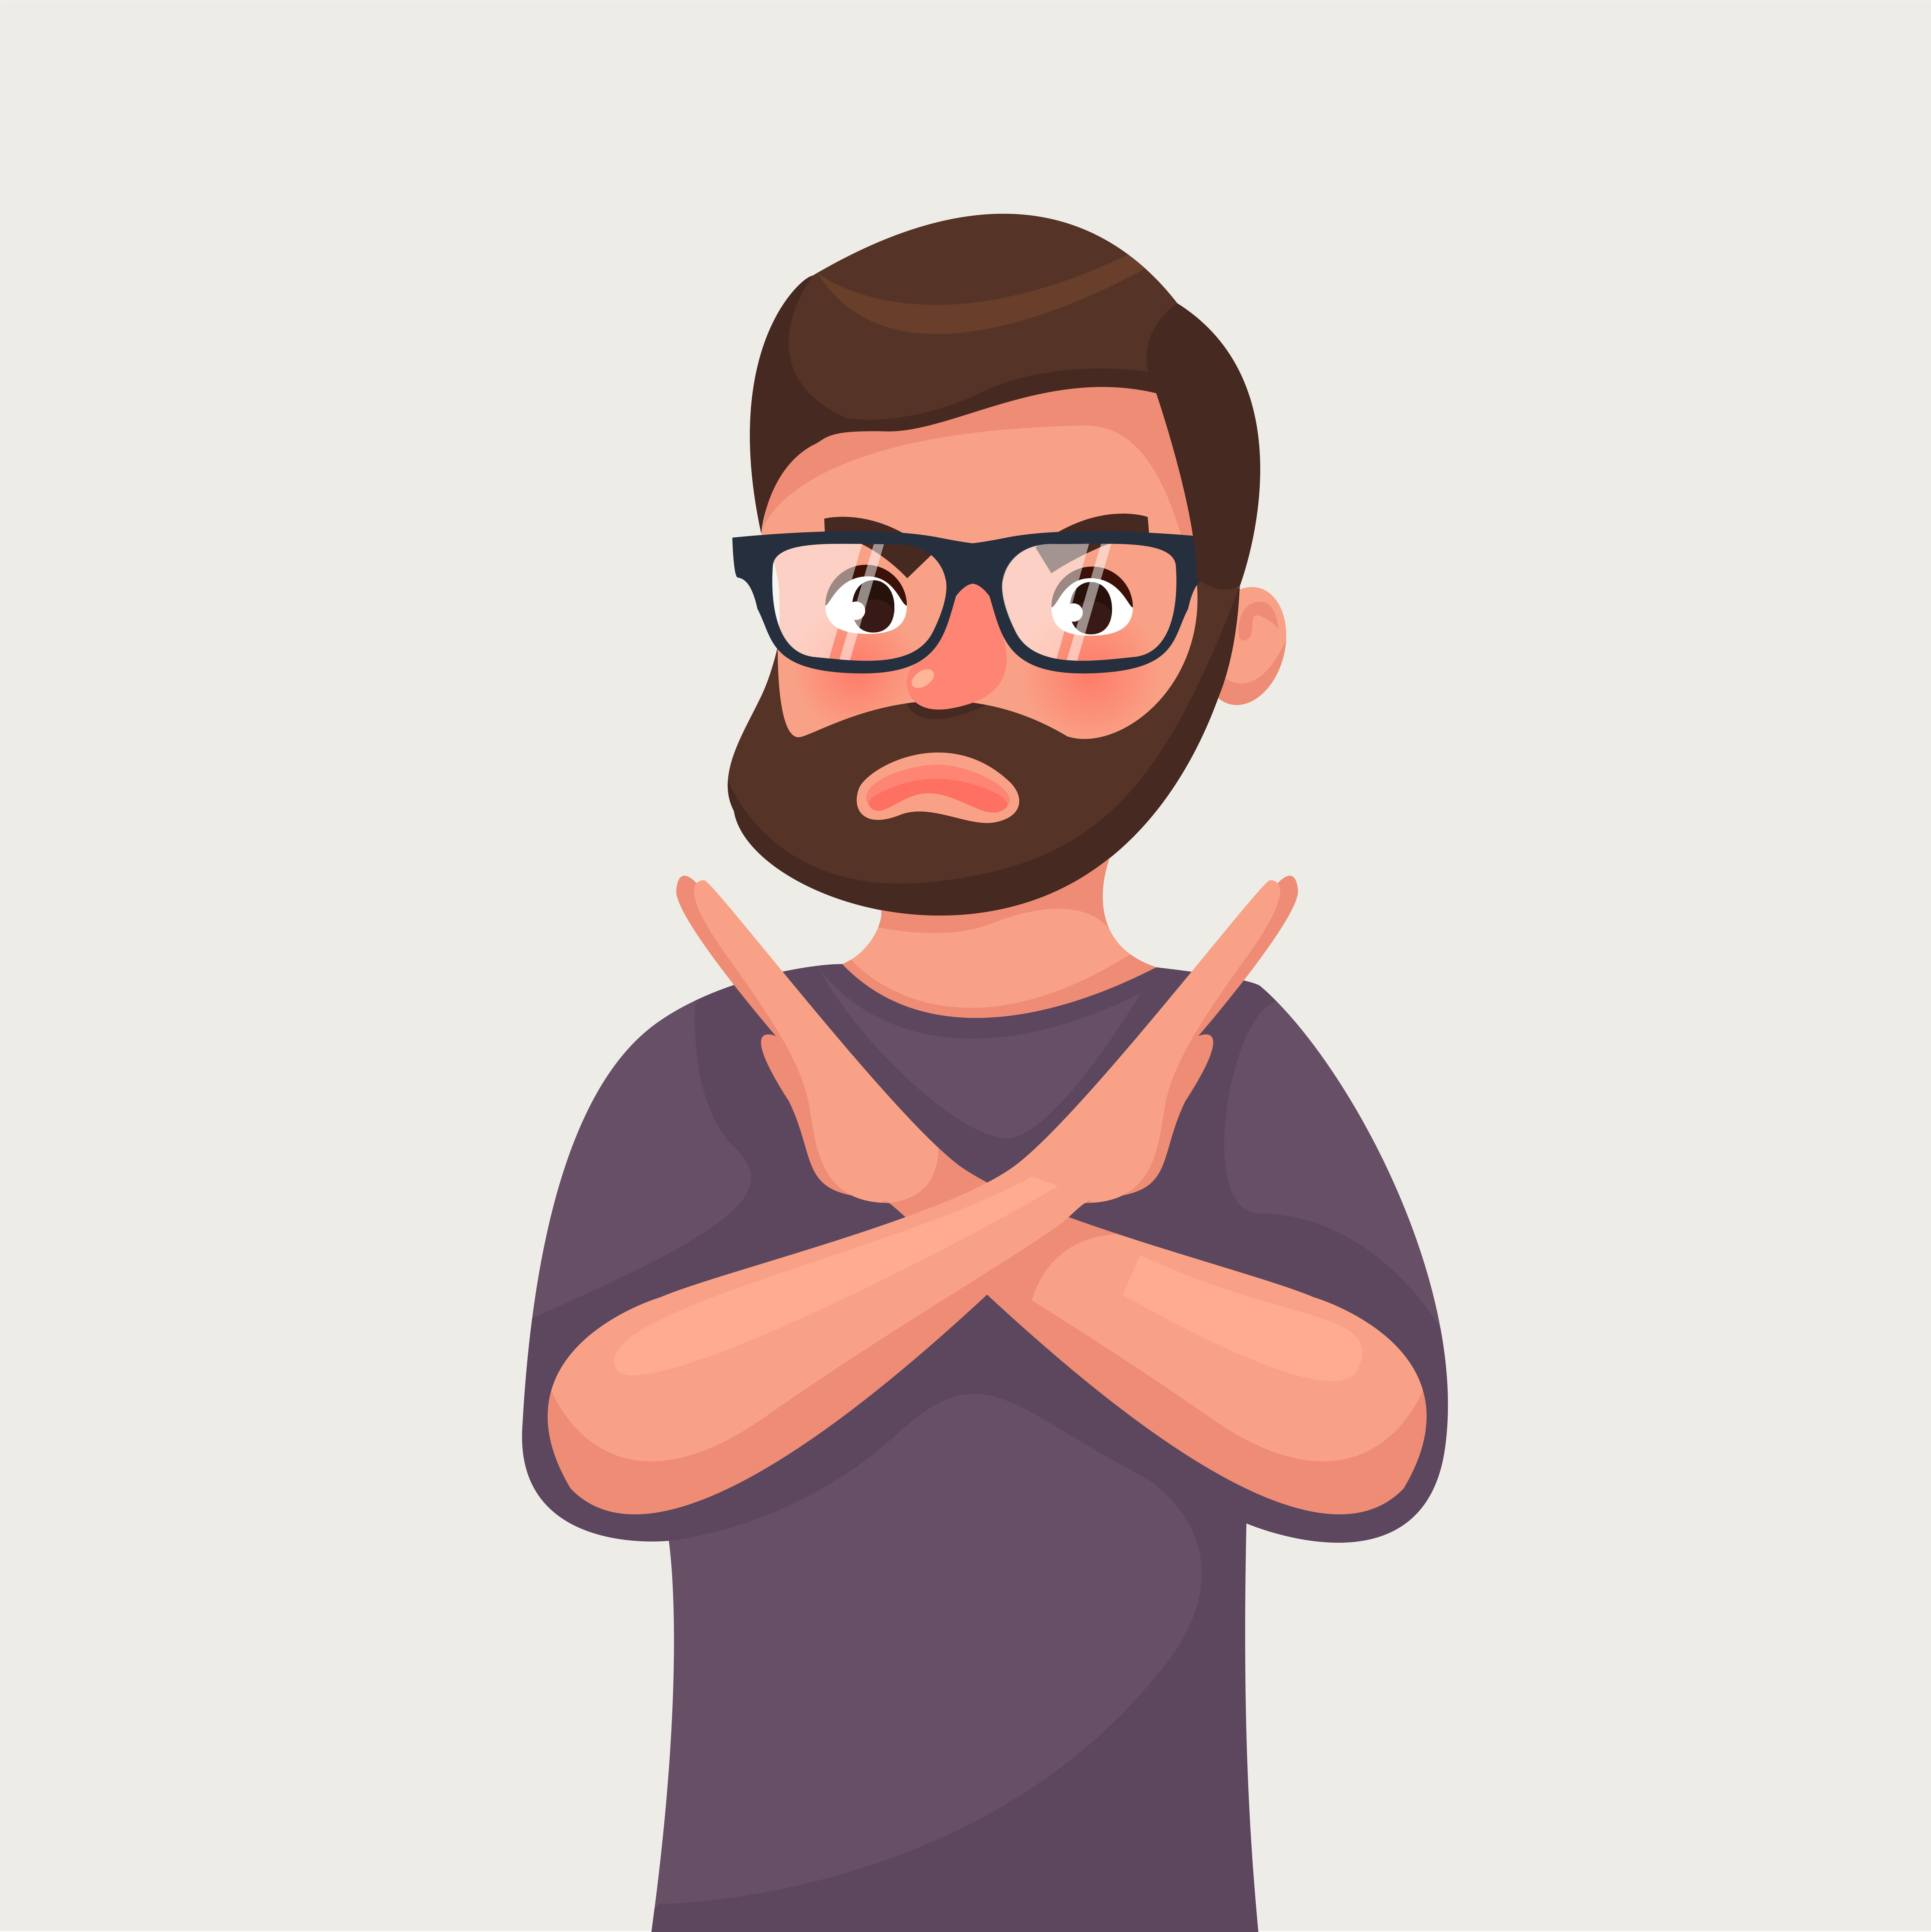 man shows a gesture stop or no vector illustration in cartoon style download free vectors clipart graphics vector art vecteezy